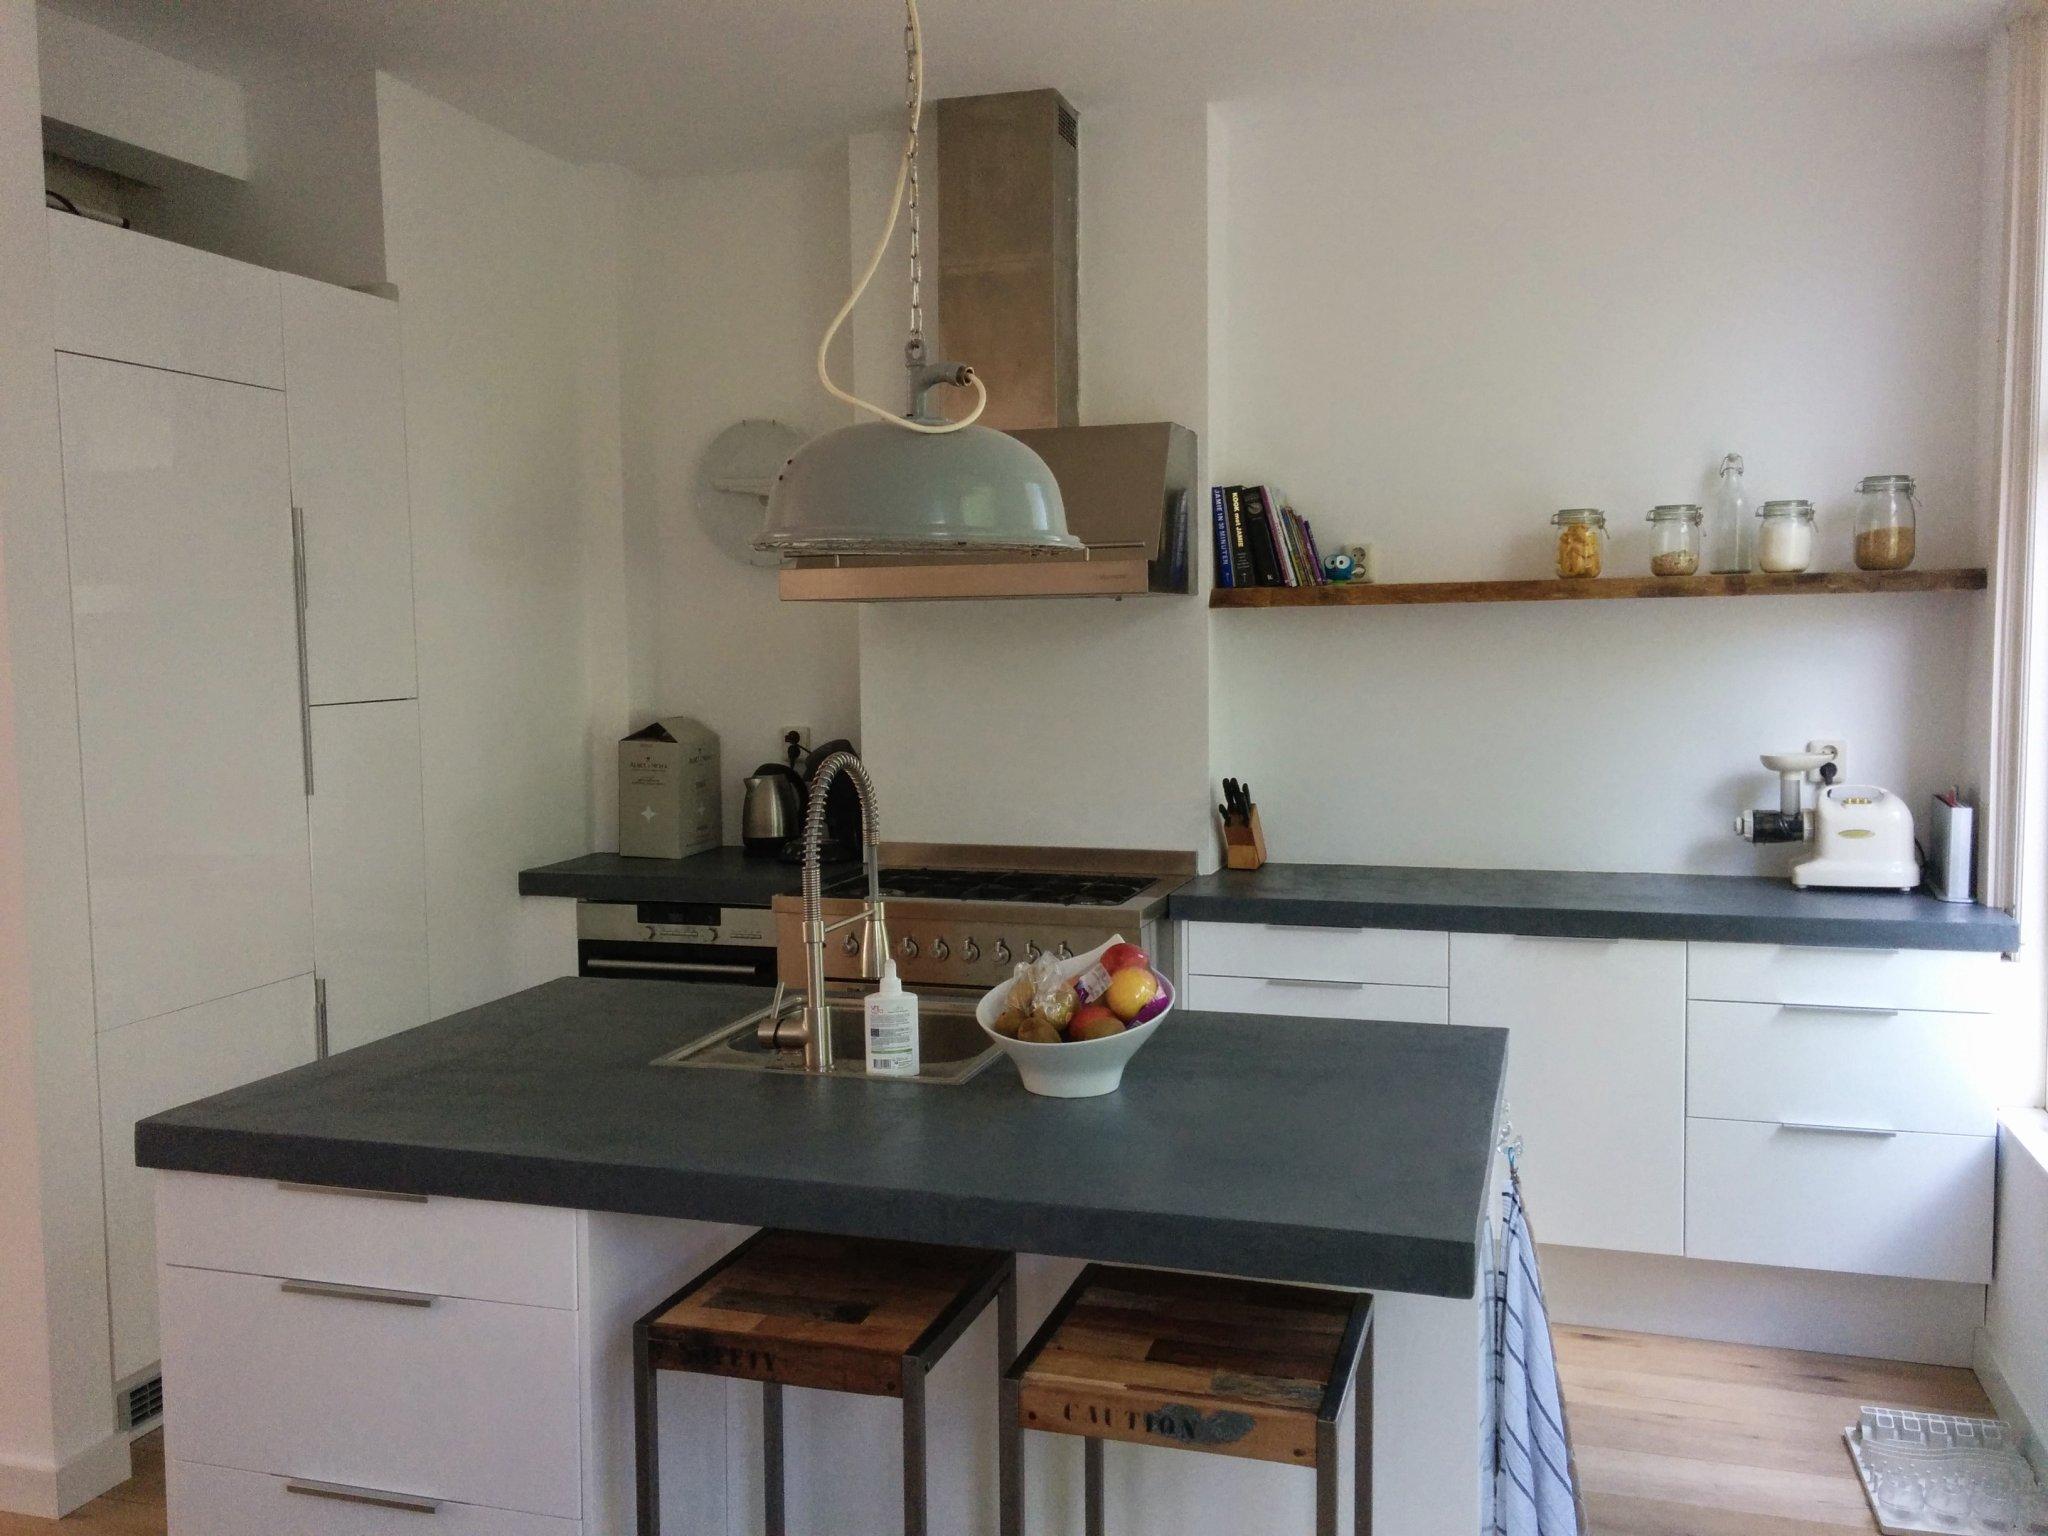 Keukenrenovatie Den Haag : Keukenrenovatie Den Haag